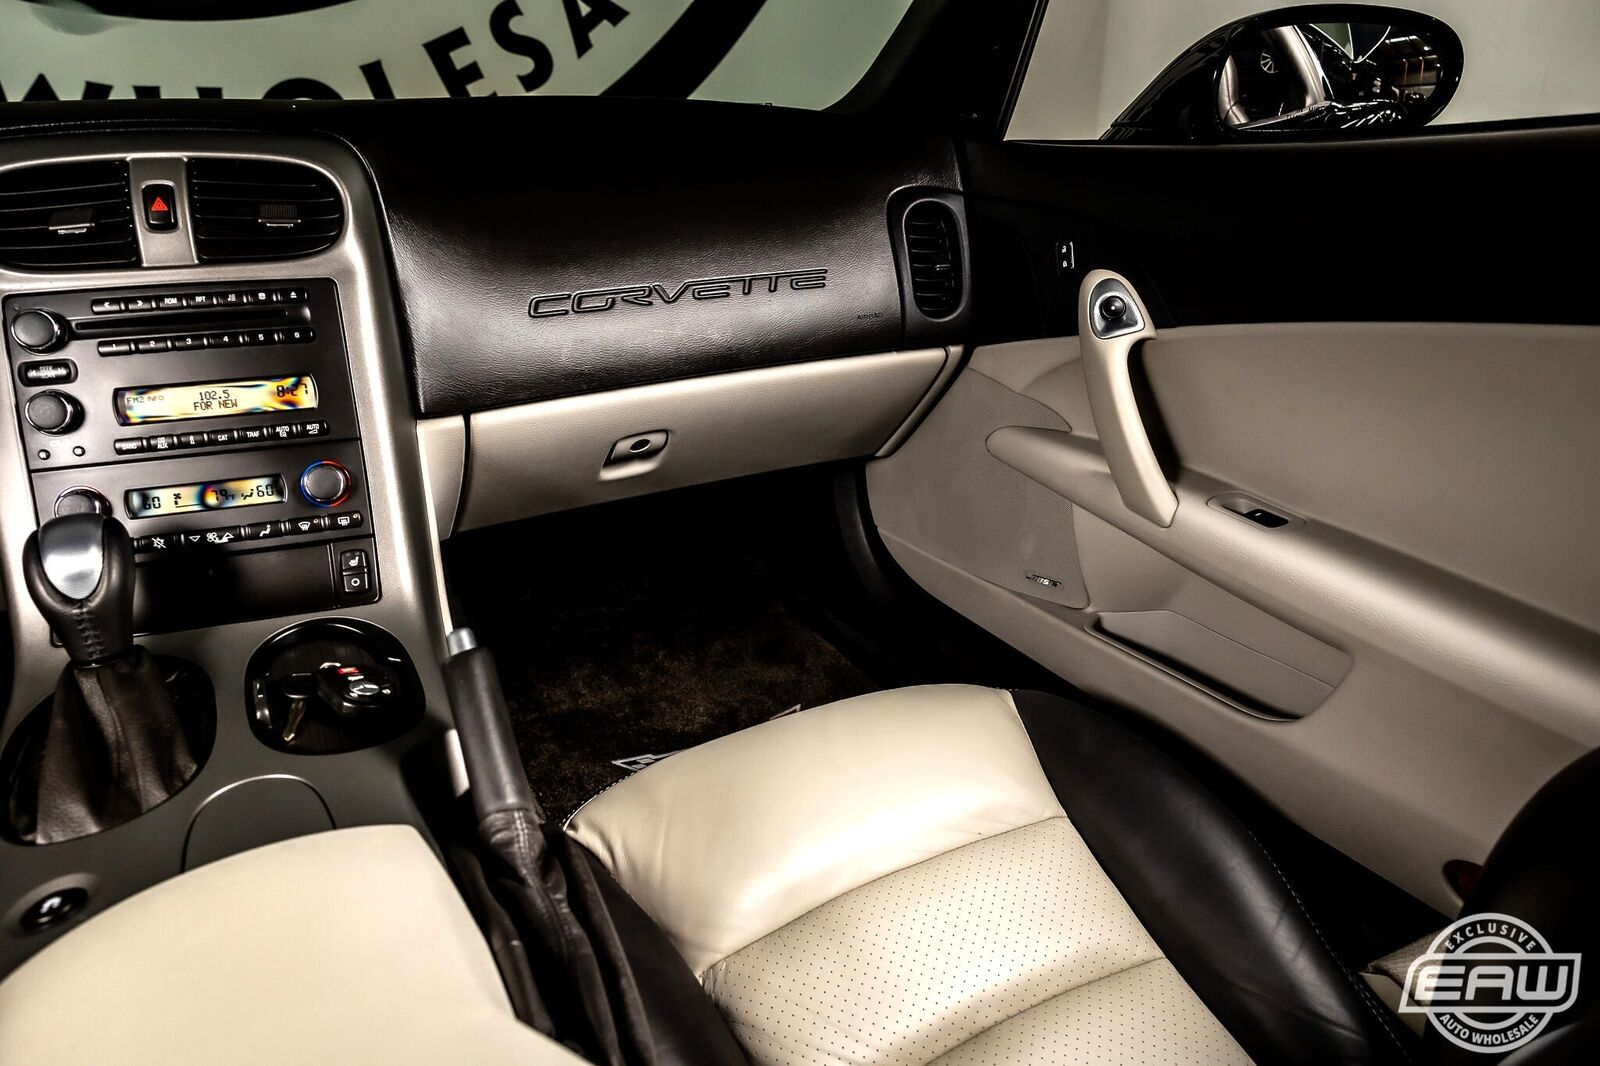 2007 Black Chevrolet Corvette Coupe  | C6 Corvette Photo 8